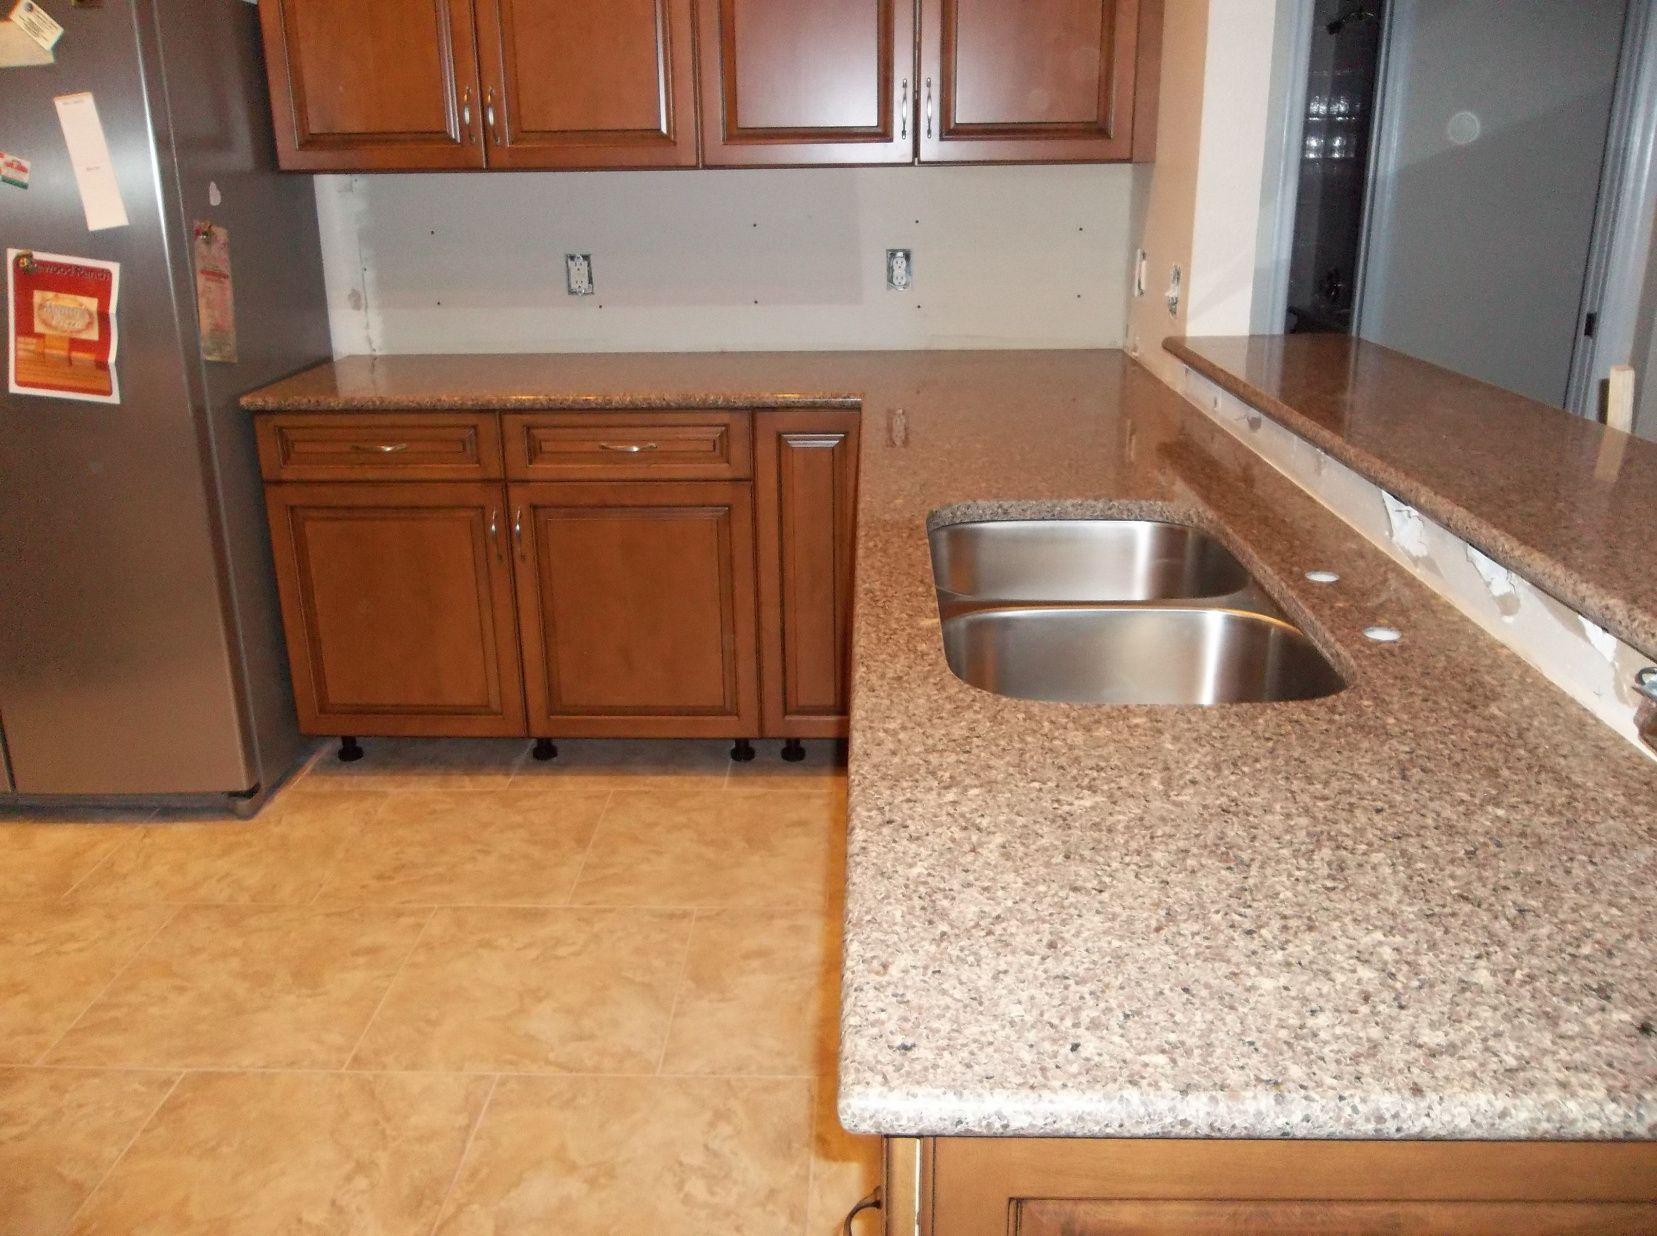 50 Allen Roth Quartz Countertops Review Kitchen Cabinets Countertops Ideas Check M Kitchen Cabinets And Countertops Cabinets And Countertops Kitchen Remodel